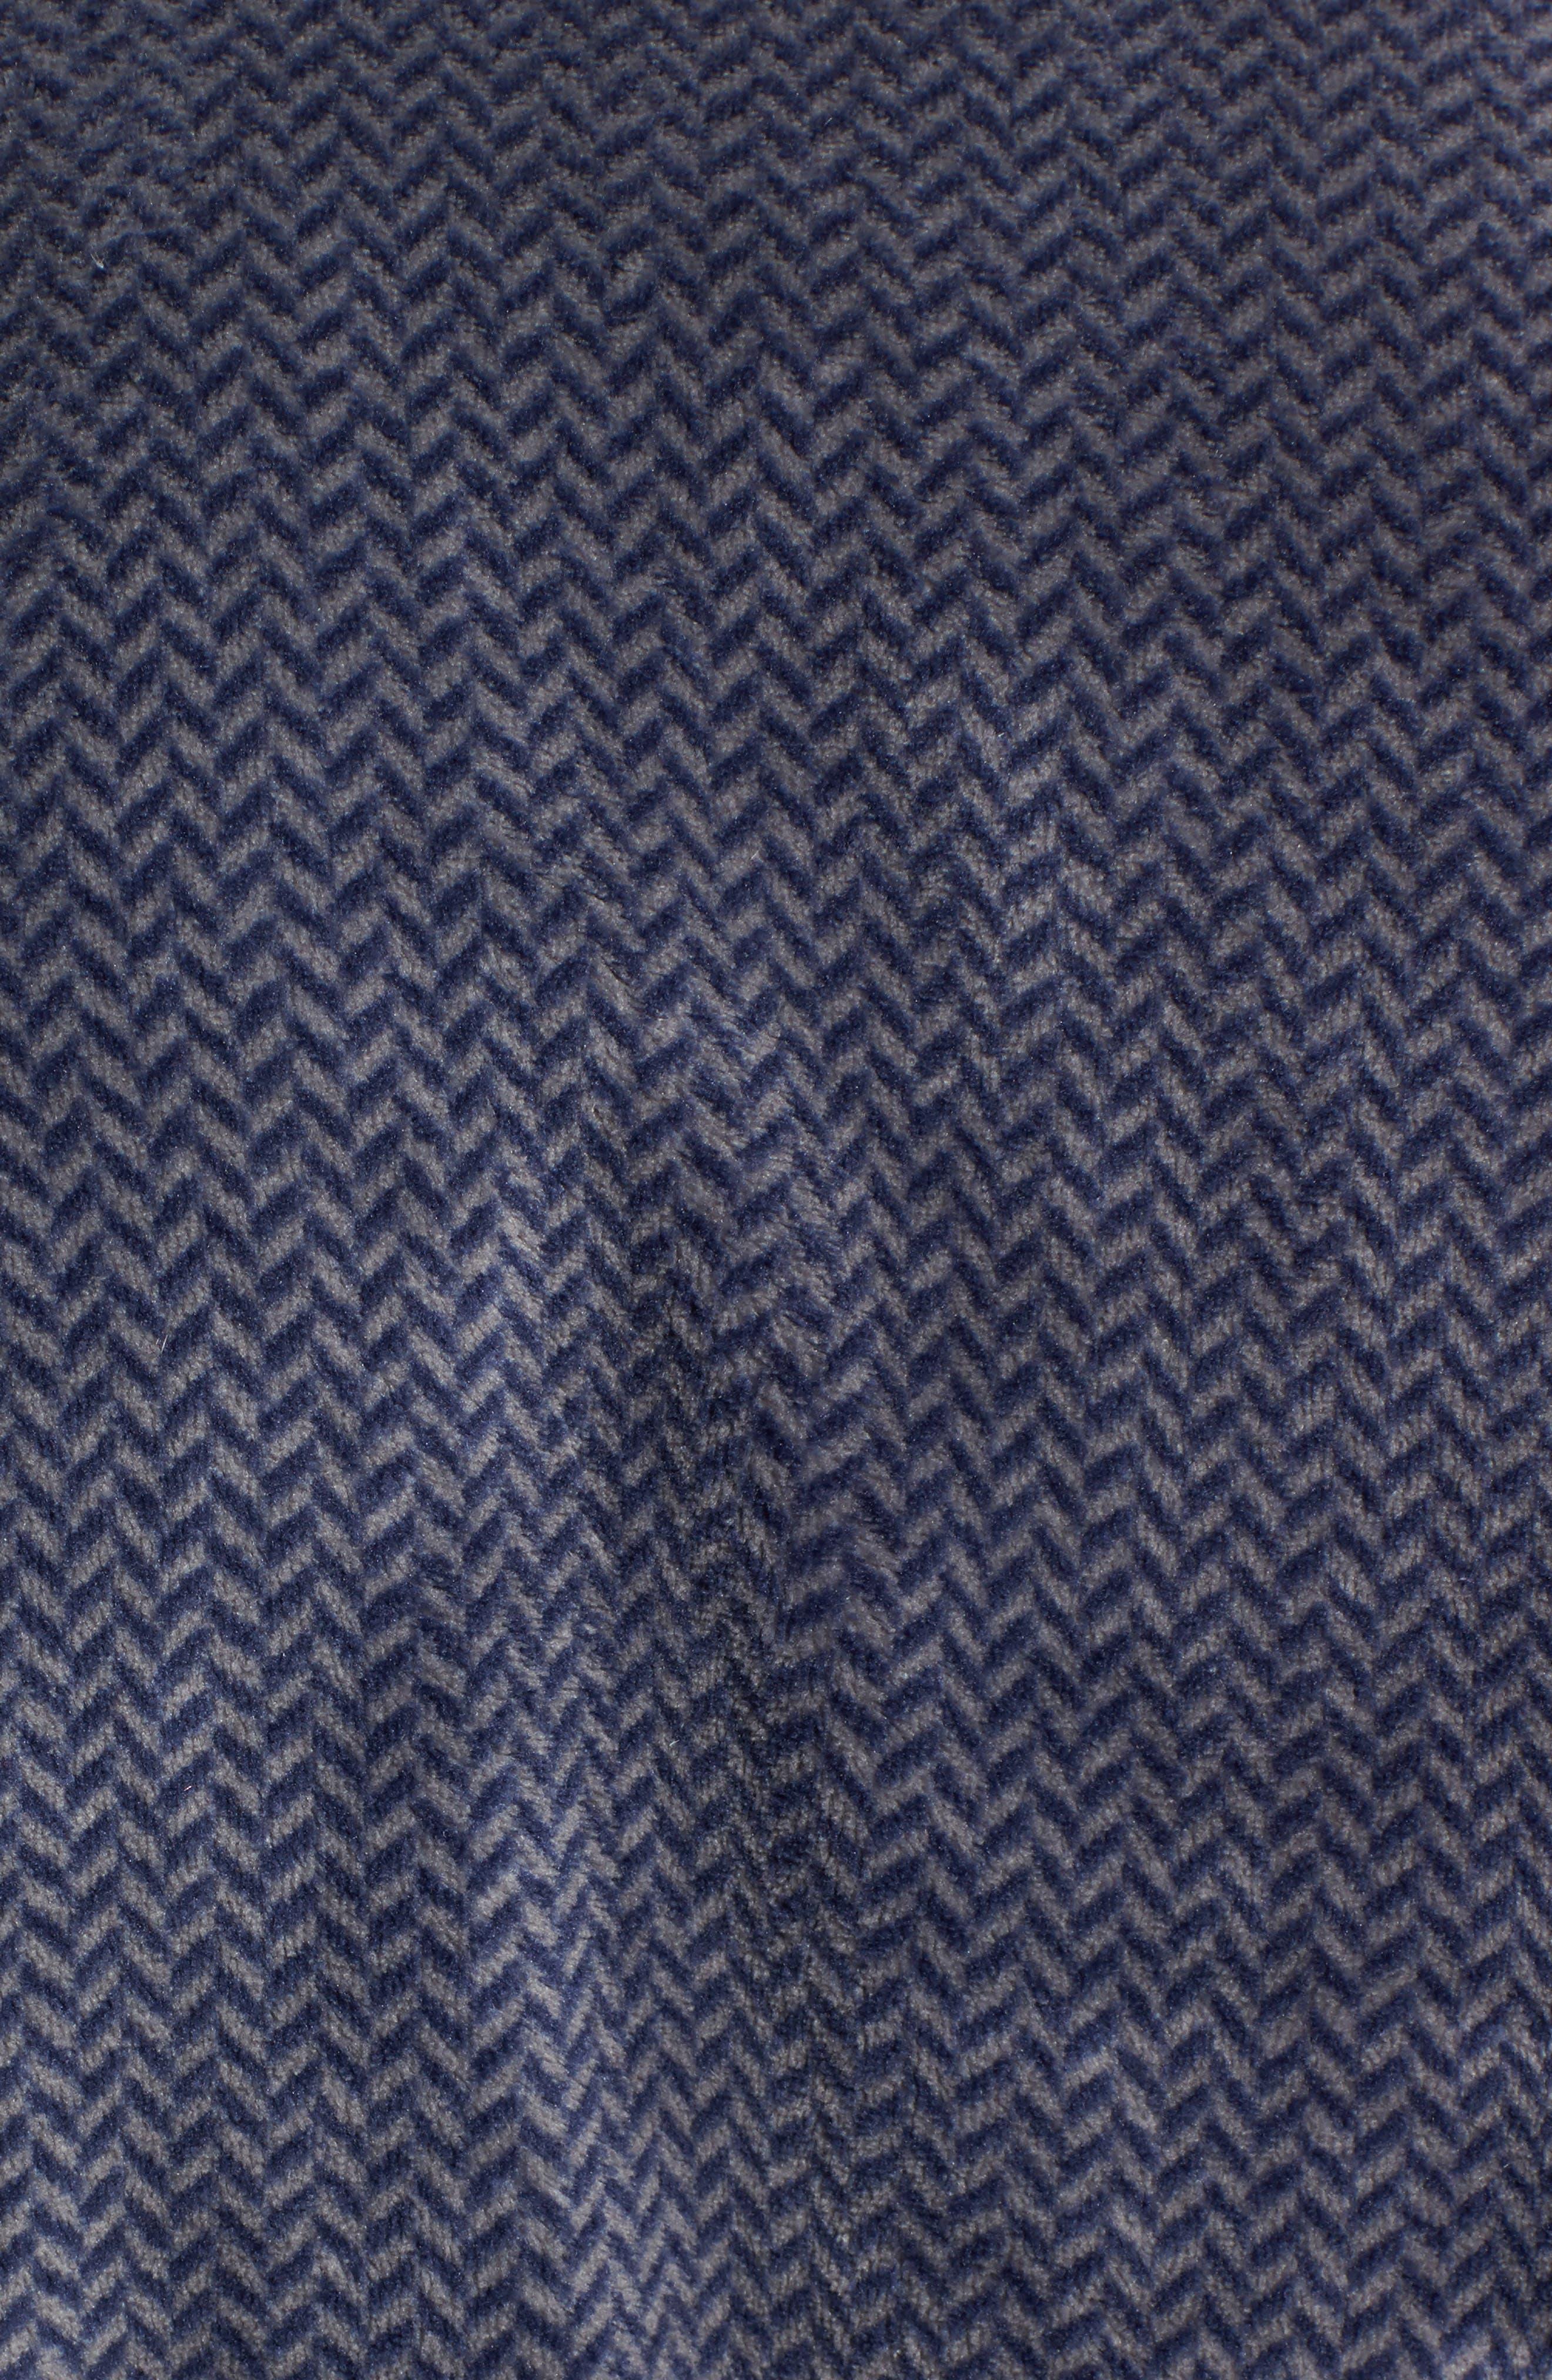 Herringbone Fleece Robe,                             Alternate thumbnail 6, color,                             Navy Indigo- Grey Herringbone